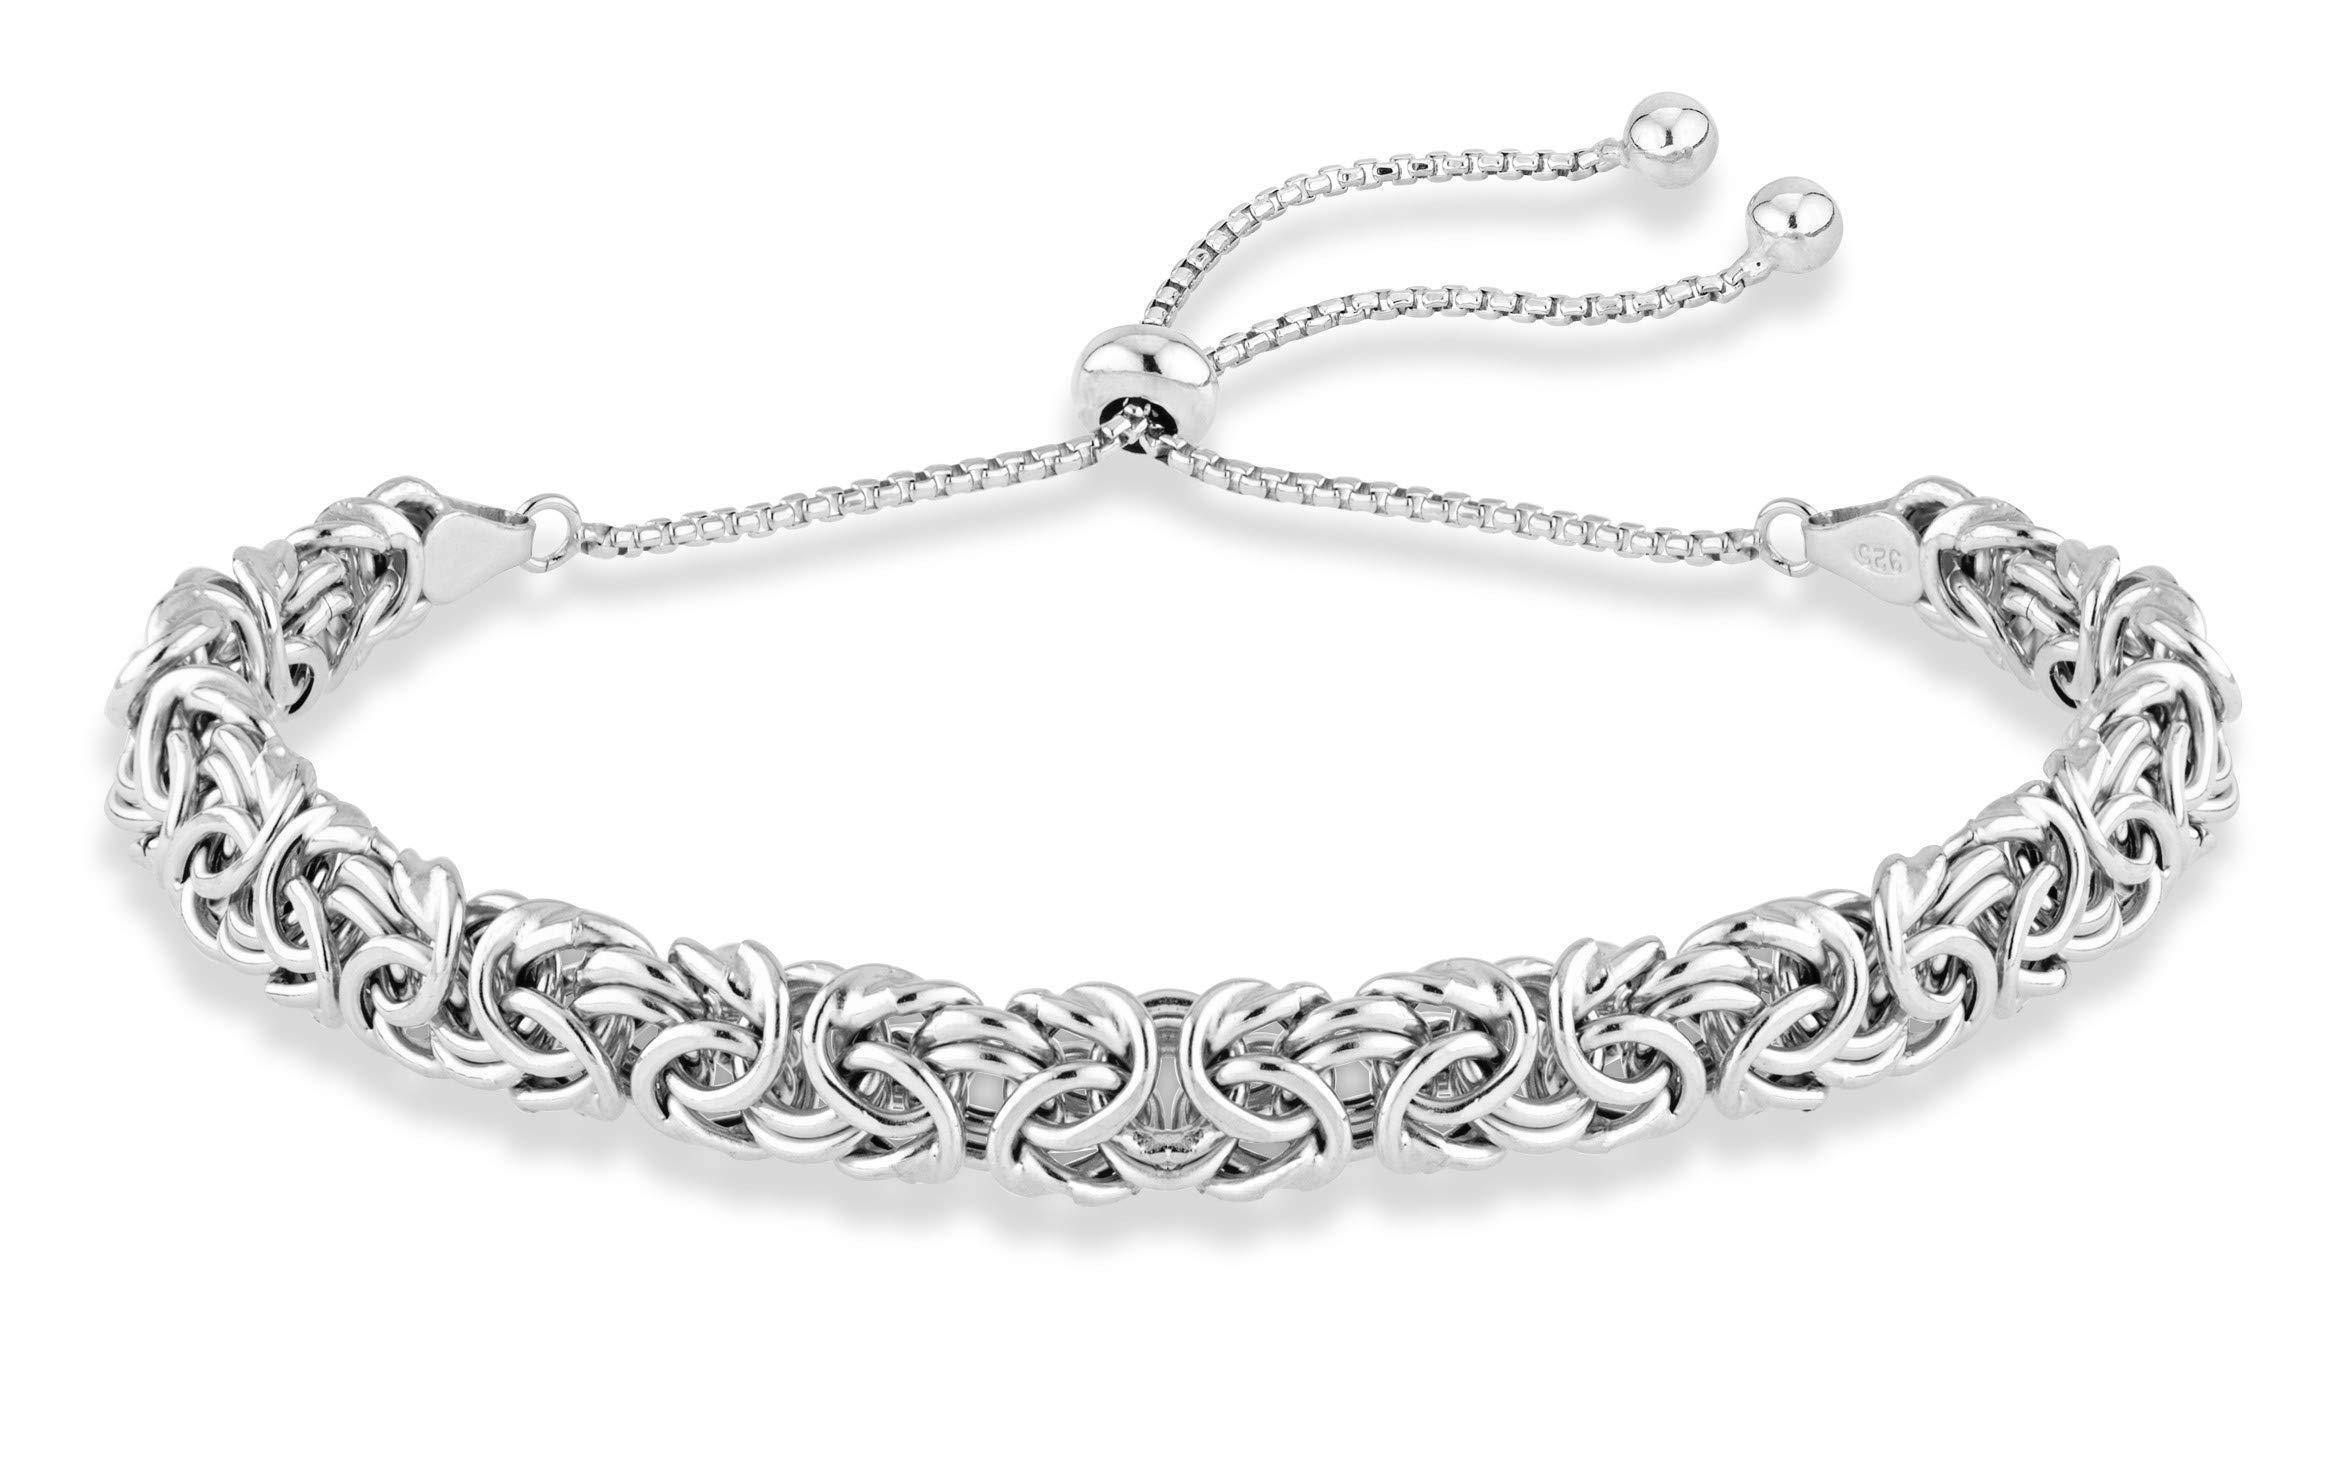 MiaBella 925 Sterling Silver Italian Byzantine Adjustable Bolo Link Chain Bracelet for Women 925 Italy